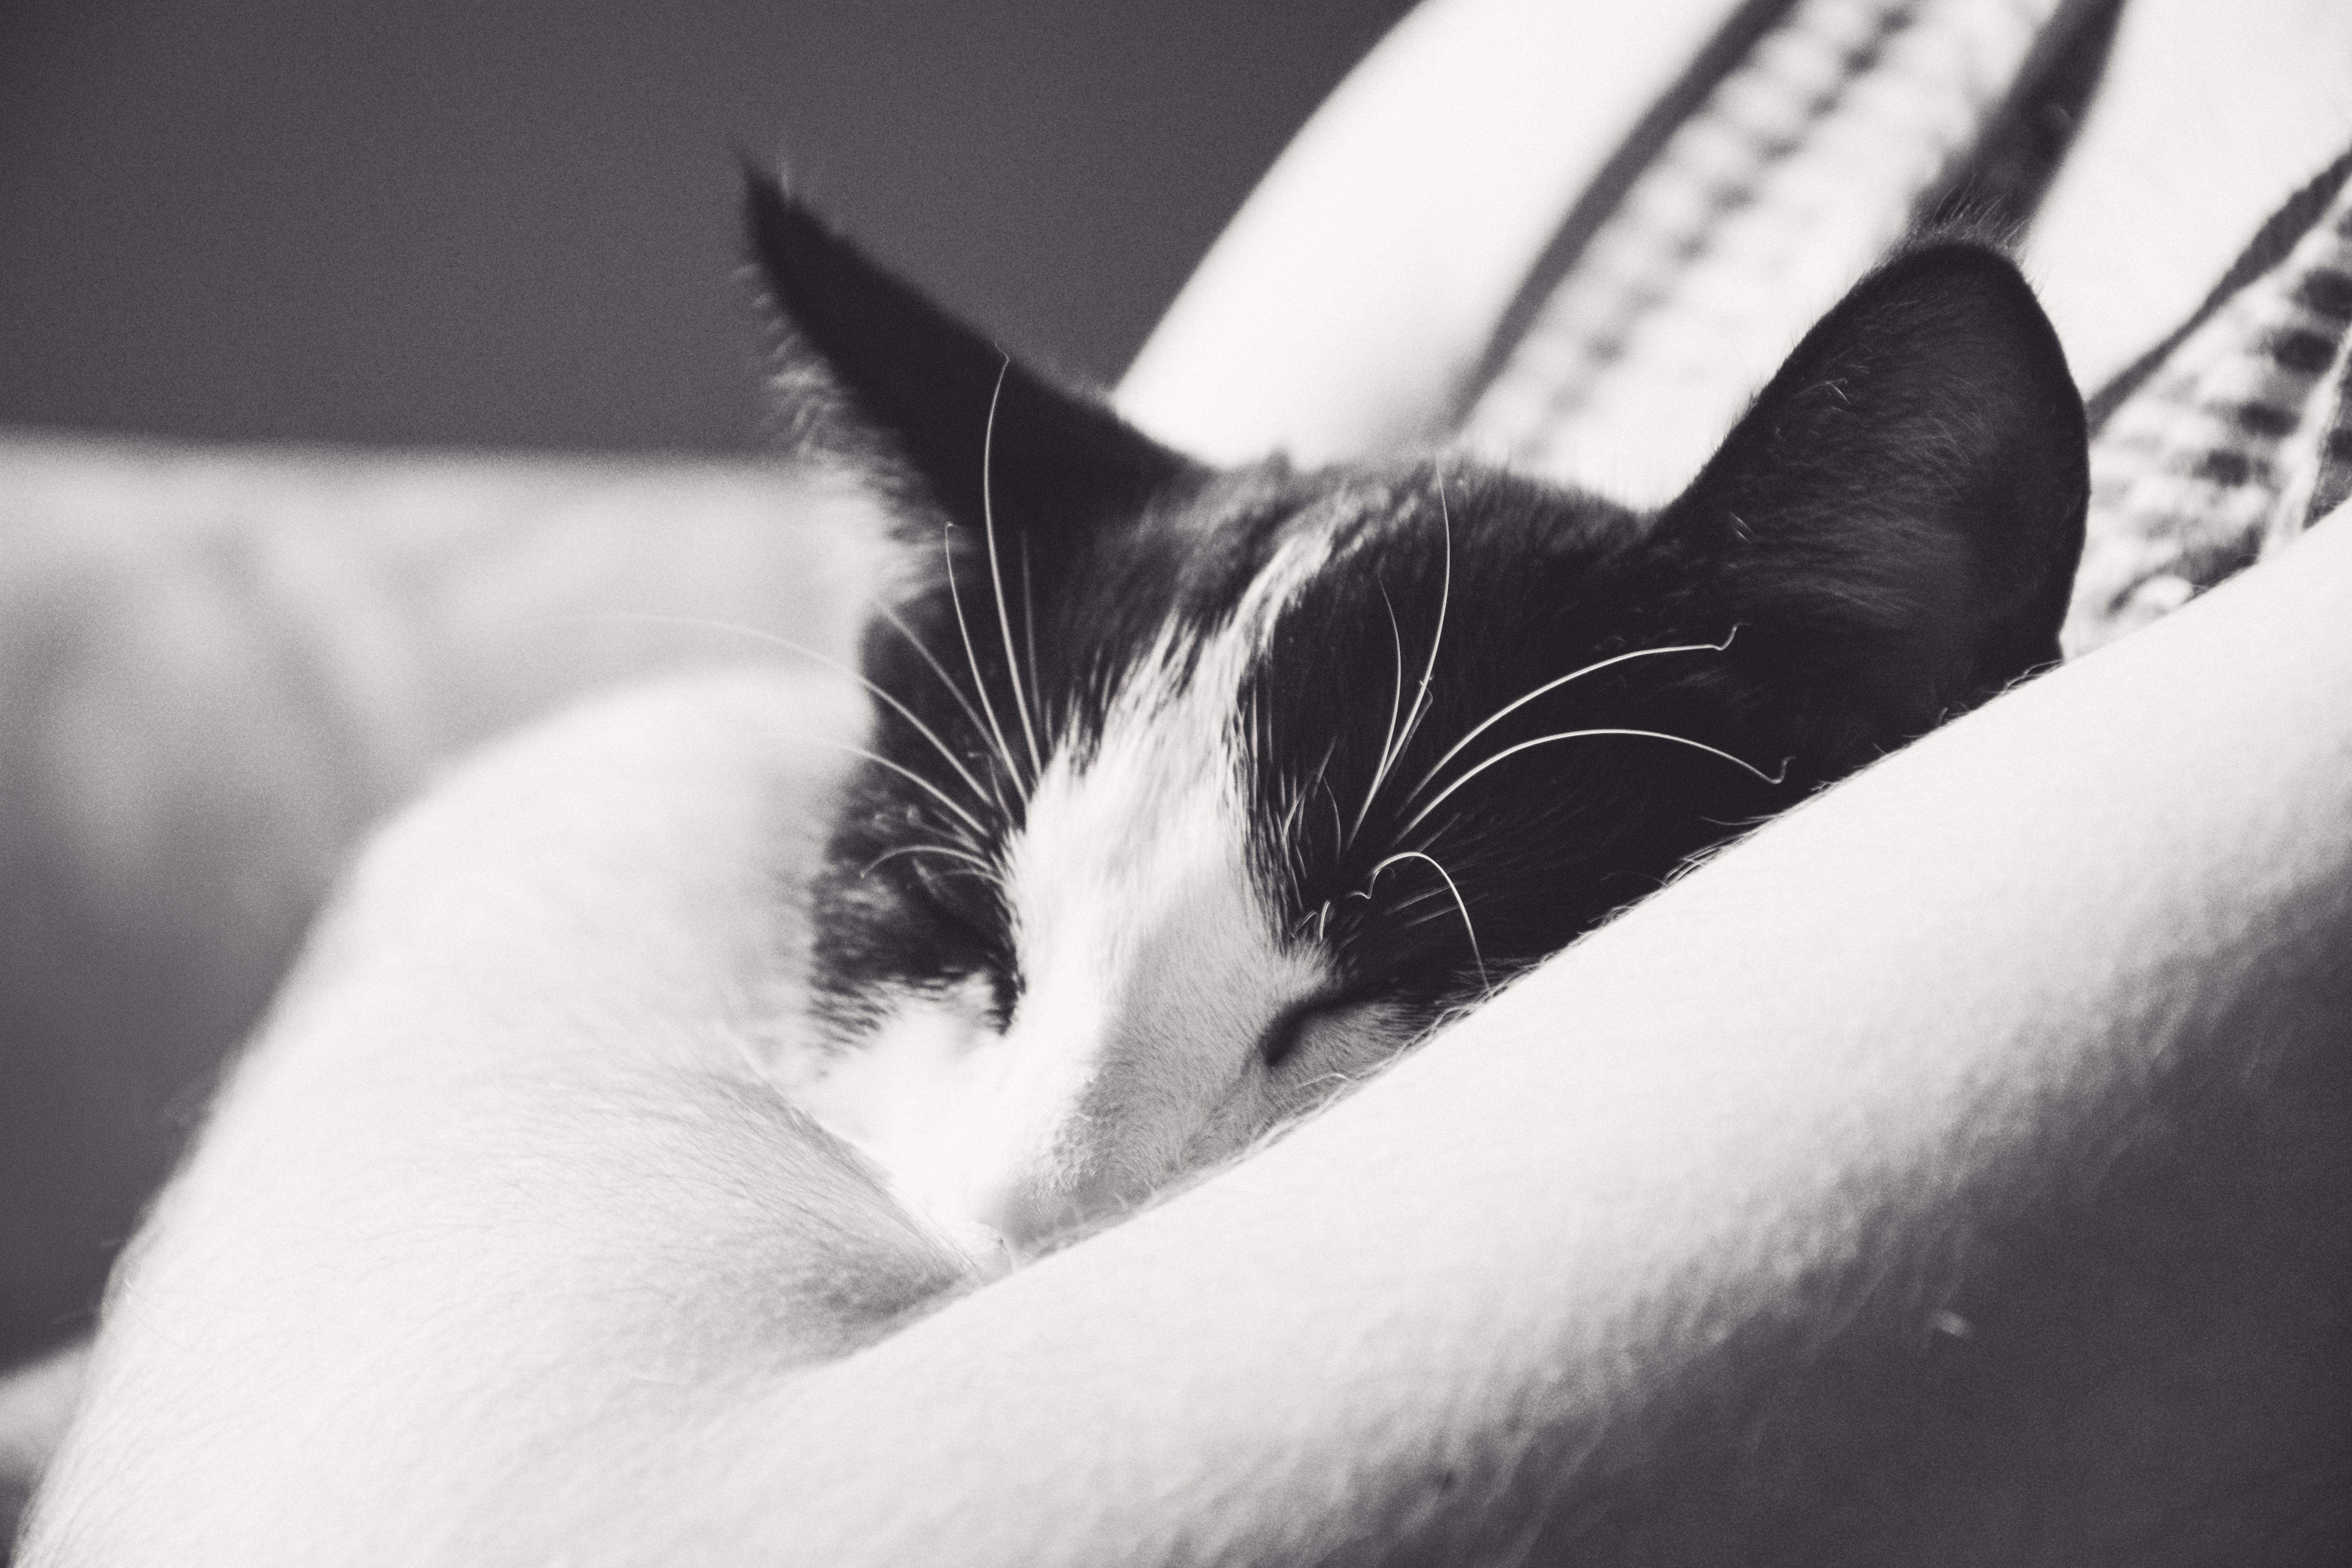 Černé obrázky zdarma kočička